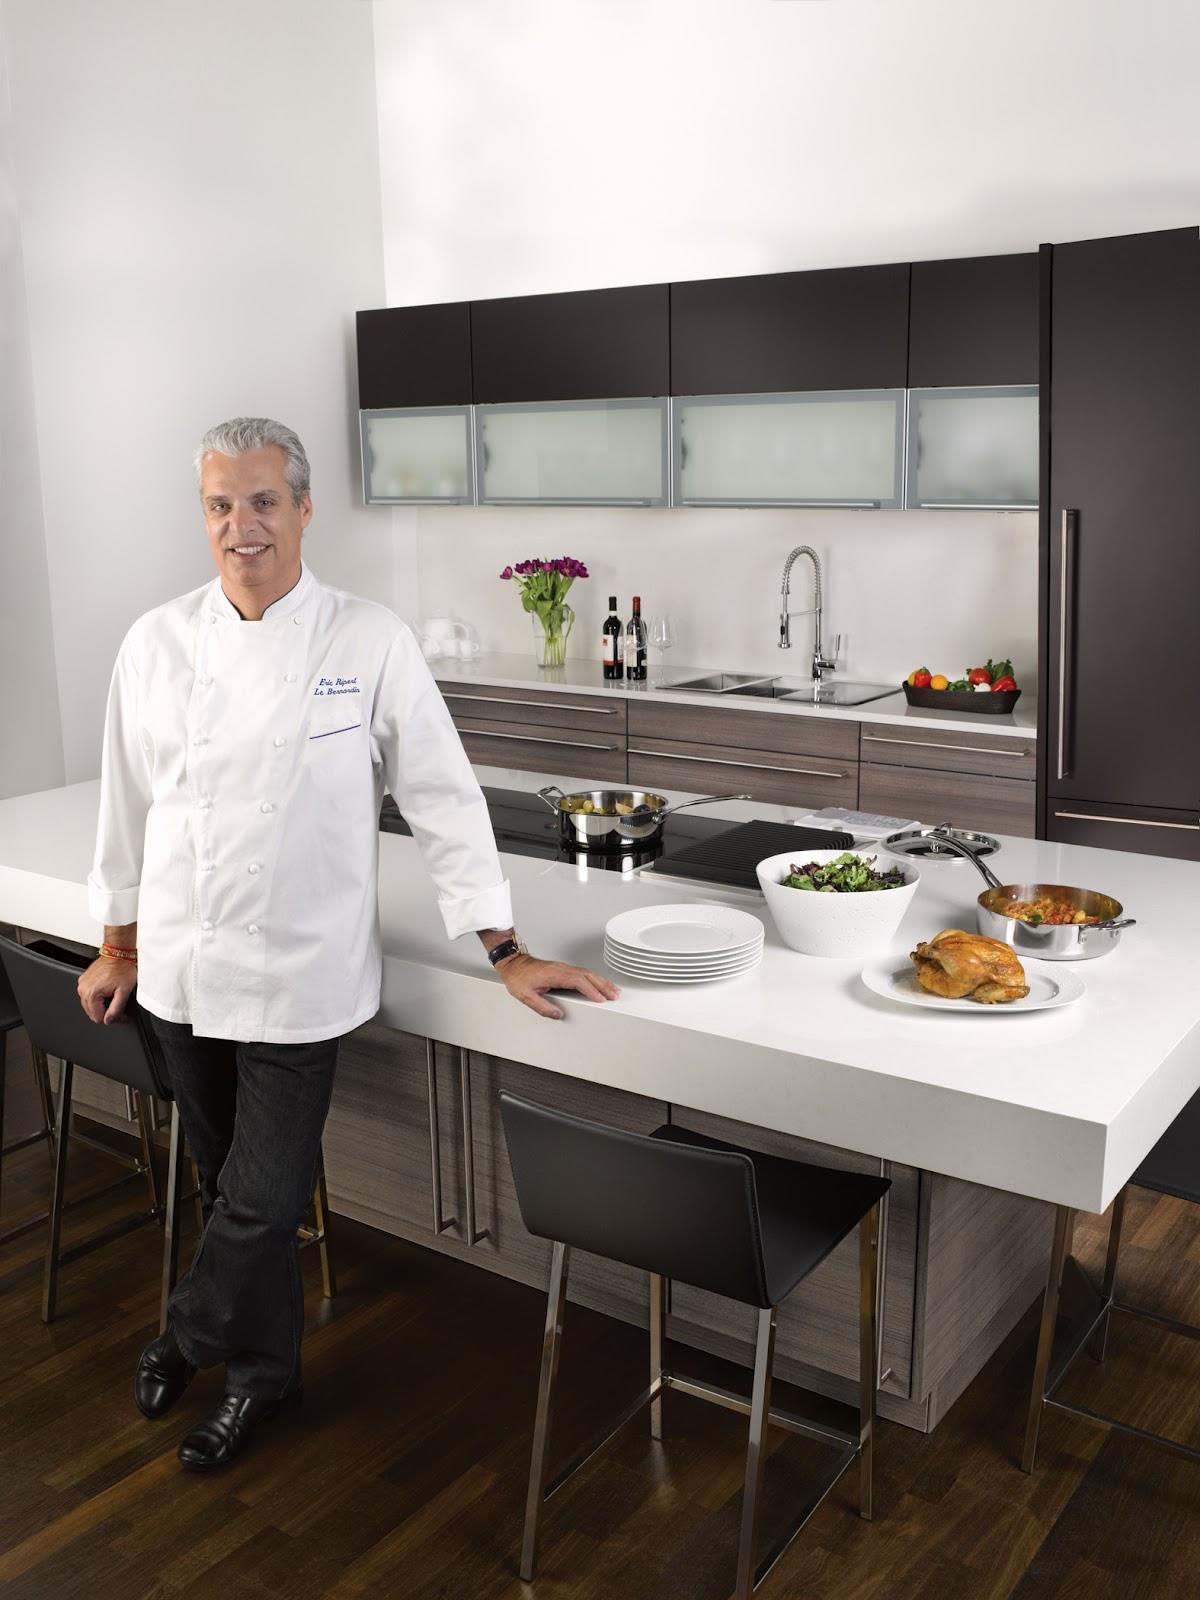 Nest By Tamara Celebrity Chef Eric Ripert Of Le Bernardin Designs A Kitchen For Poggenpohl